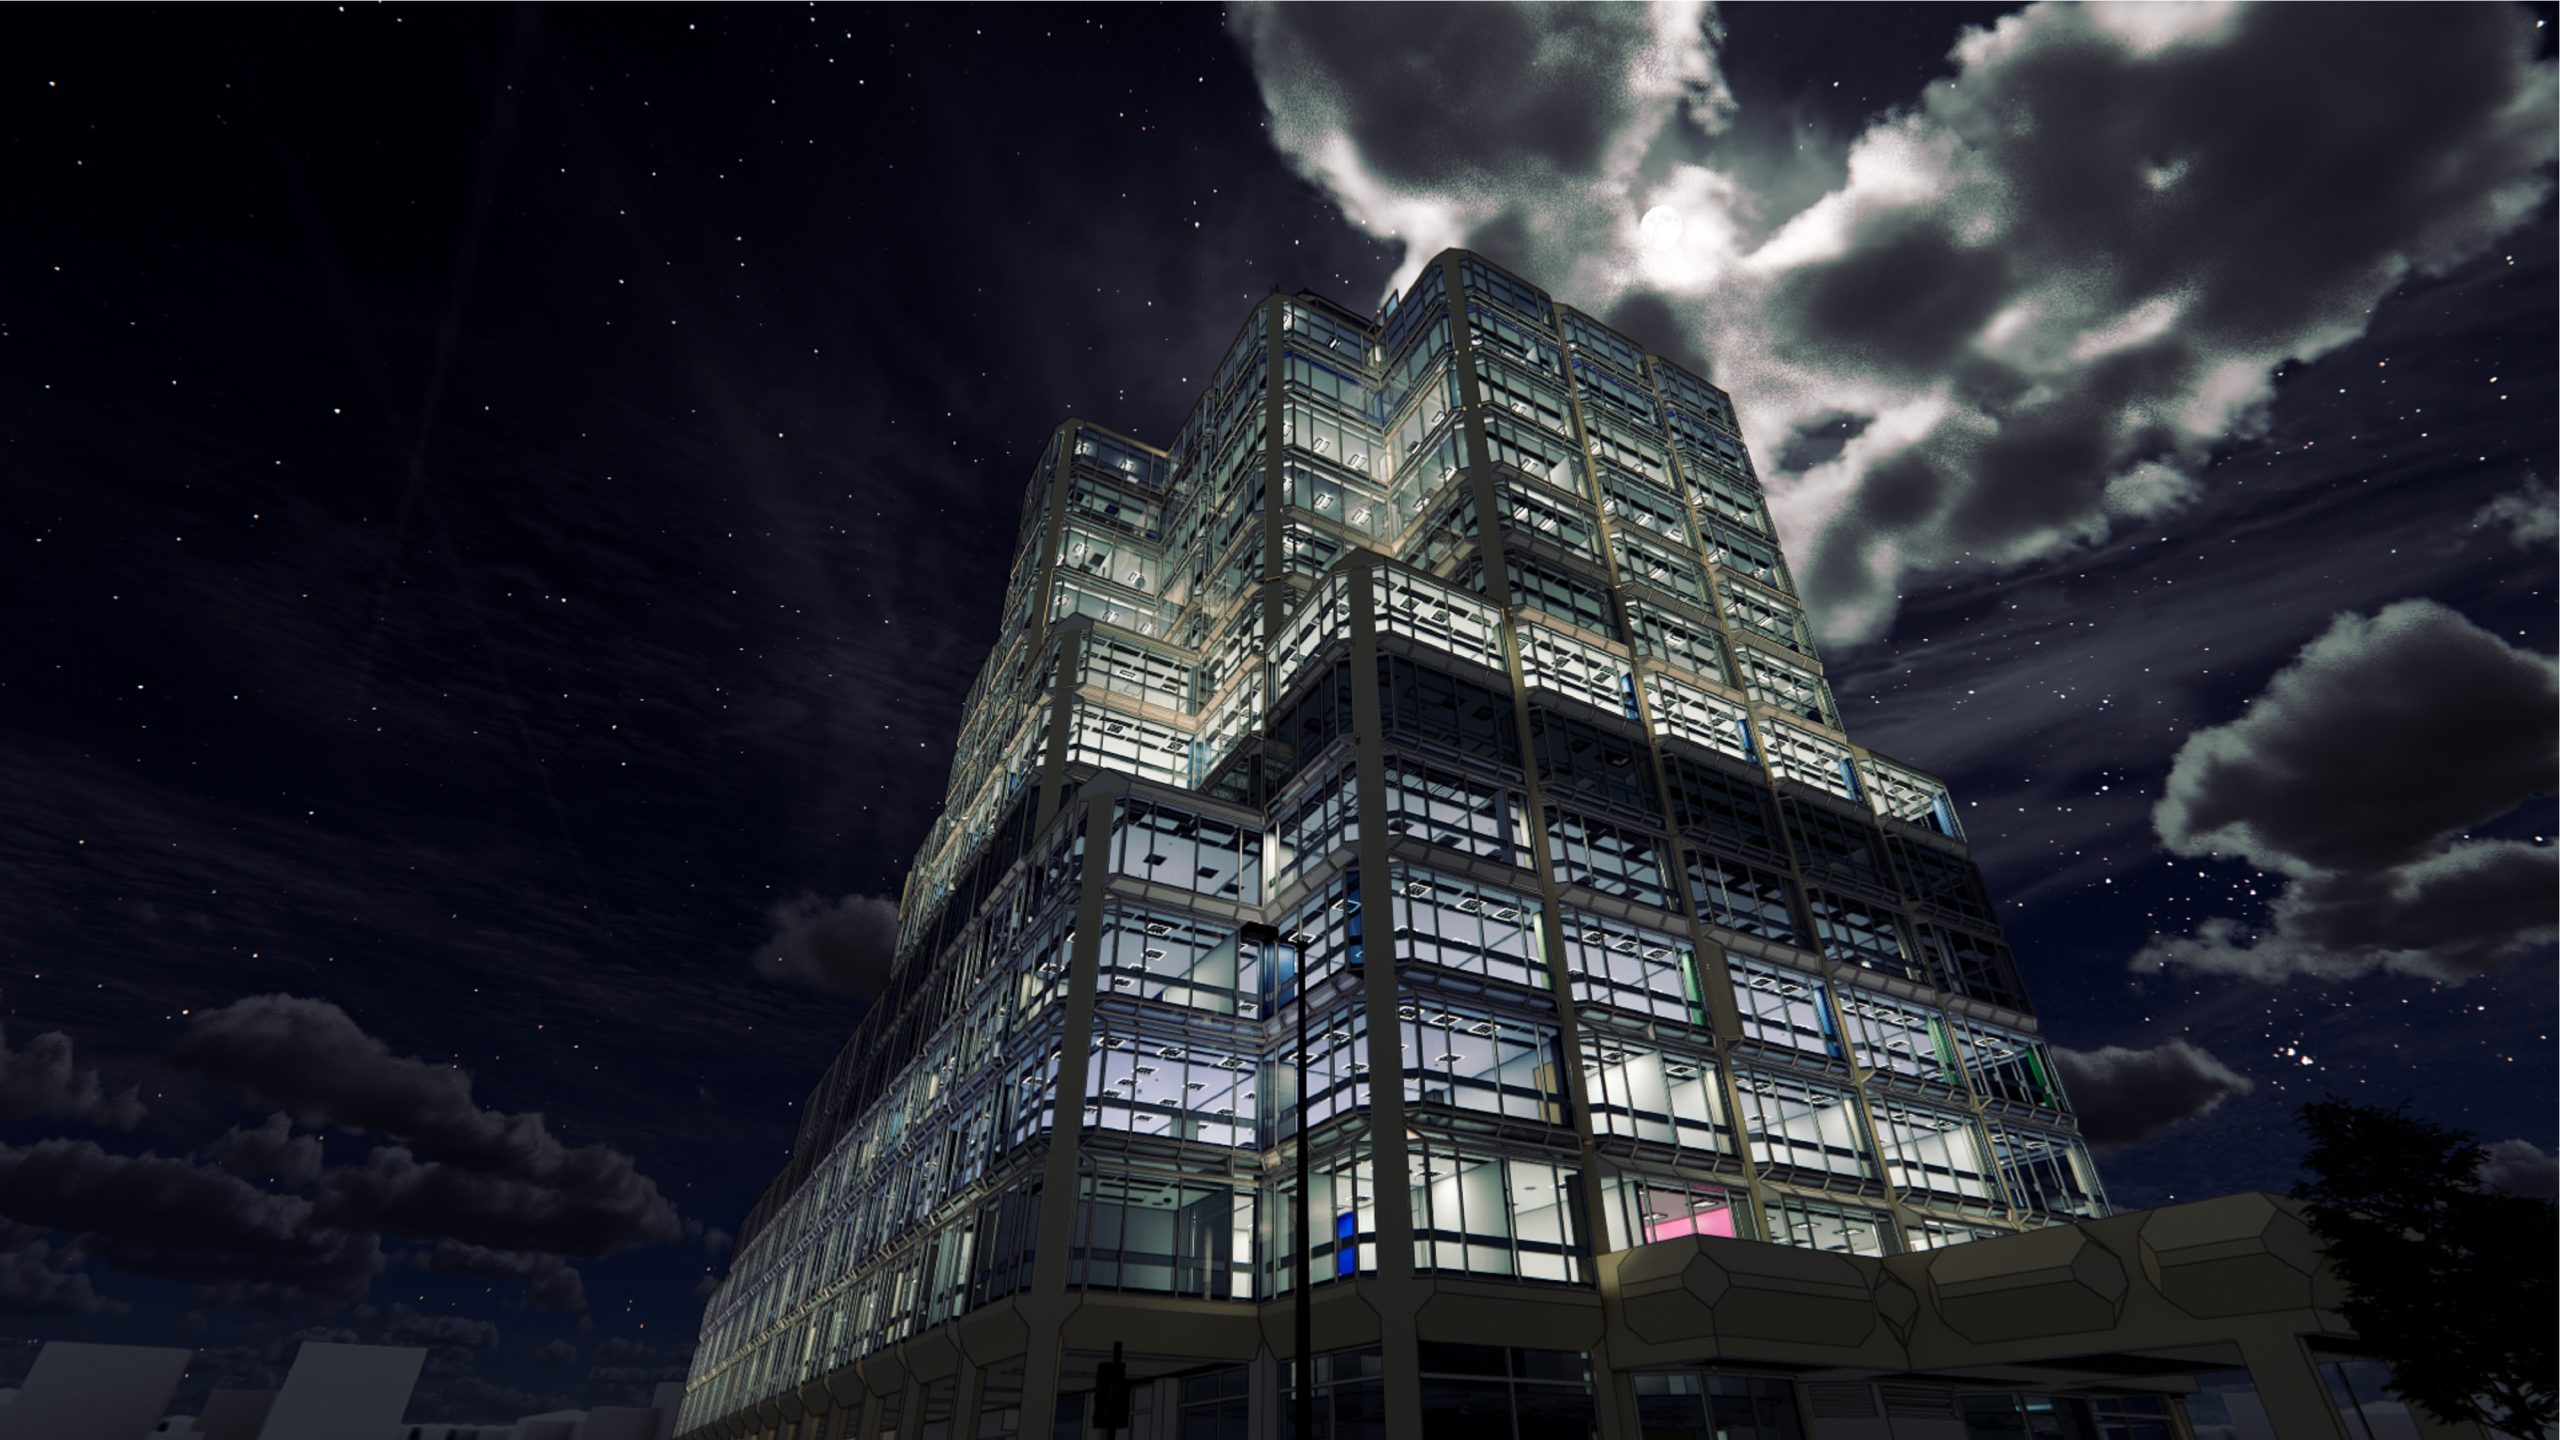 John Lewis Headquarters rendering at night